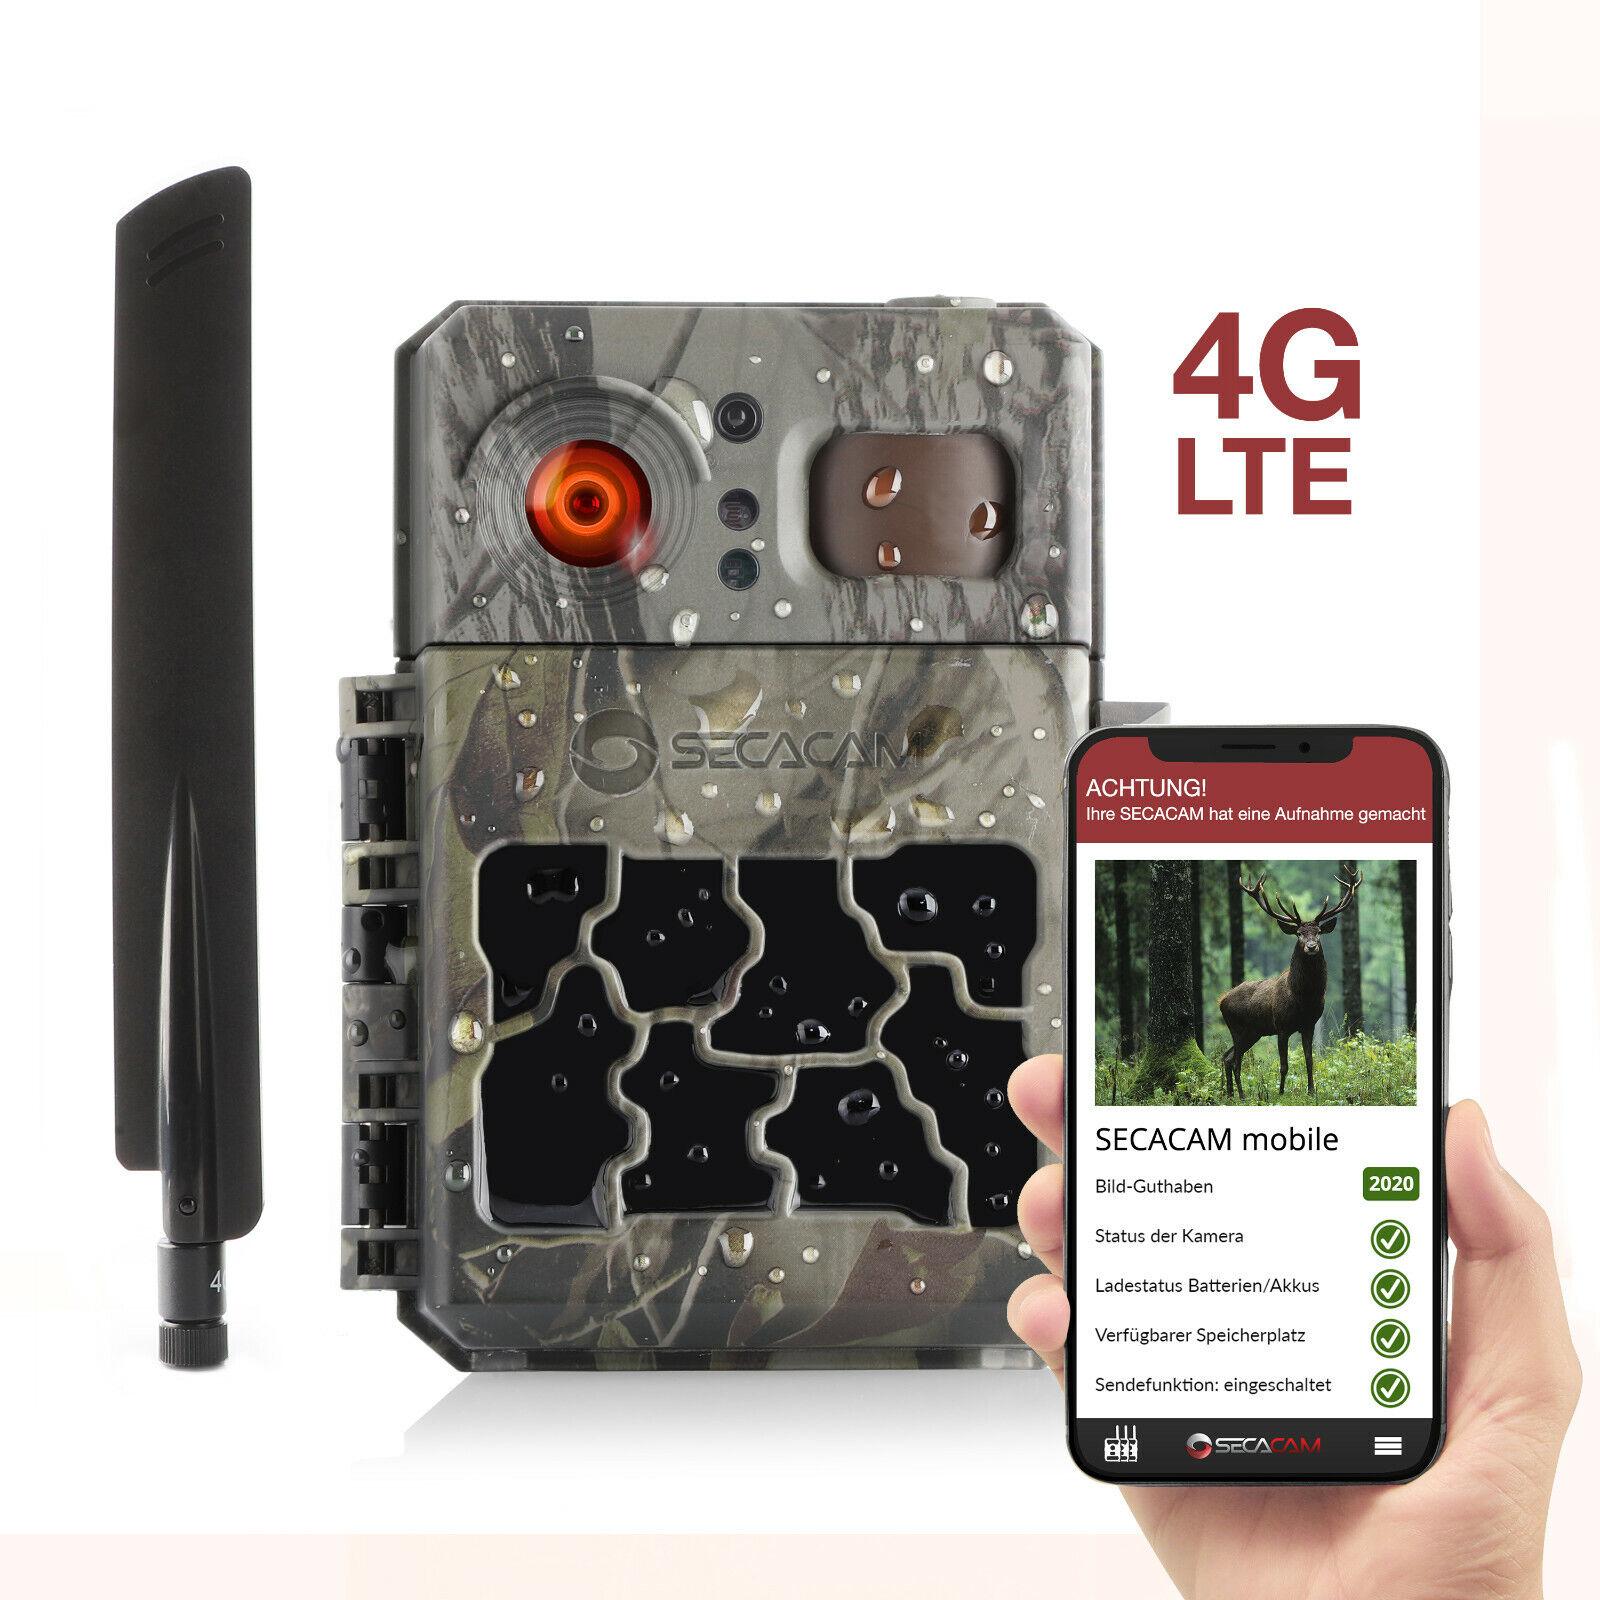 4G Wildkamera SECACAM PRO Plus mobile LTE, SIM-Karte, App, Bildübertragung Handy